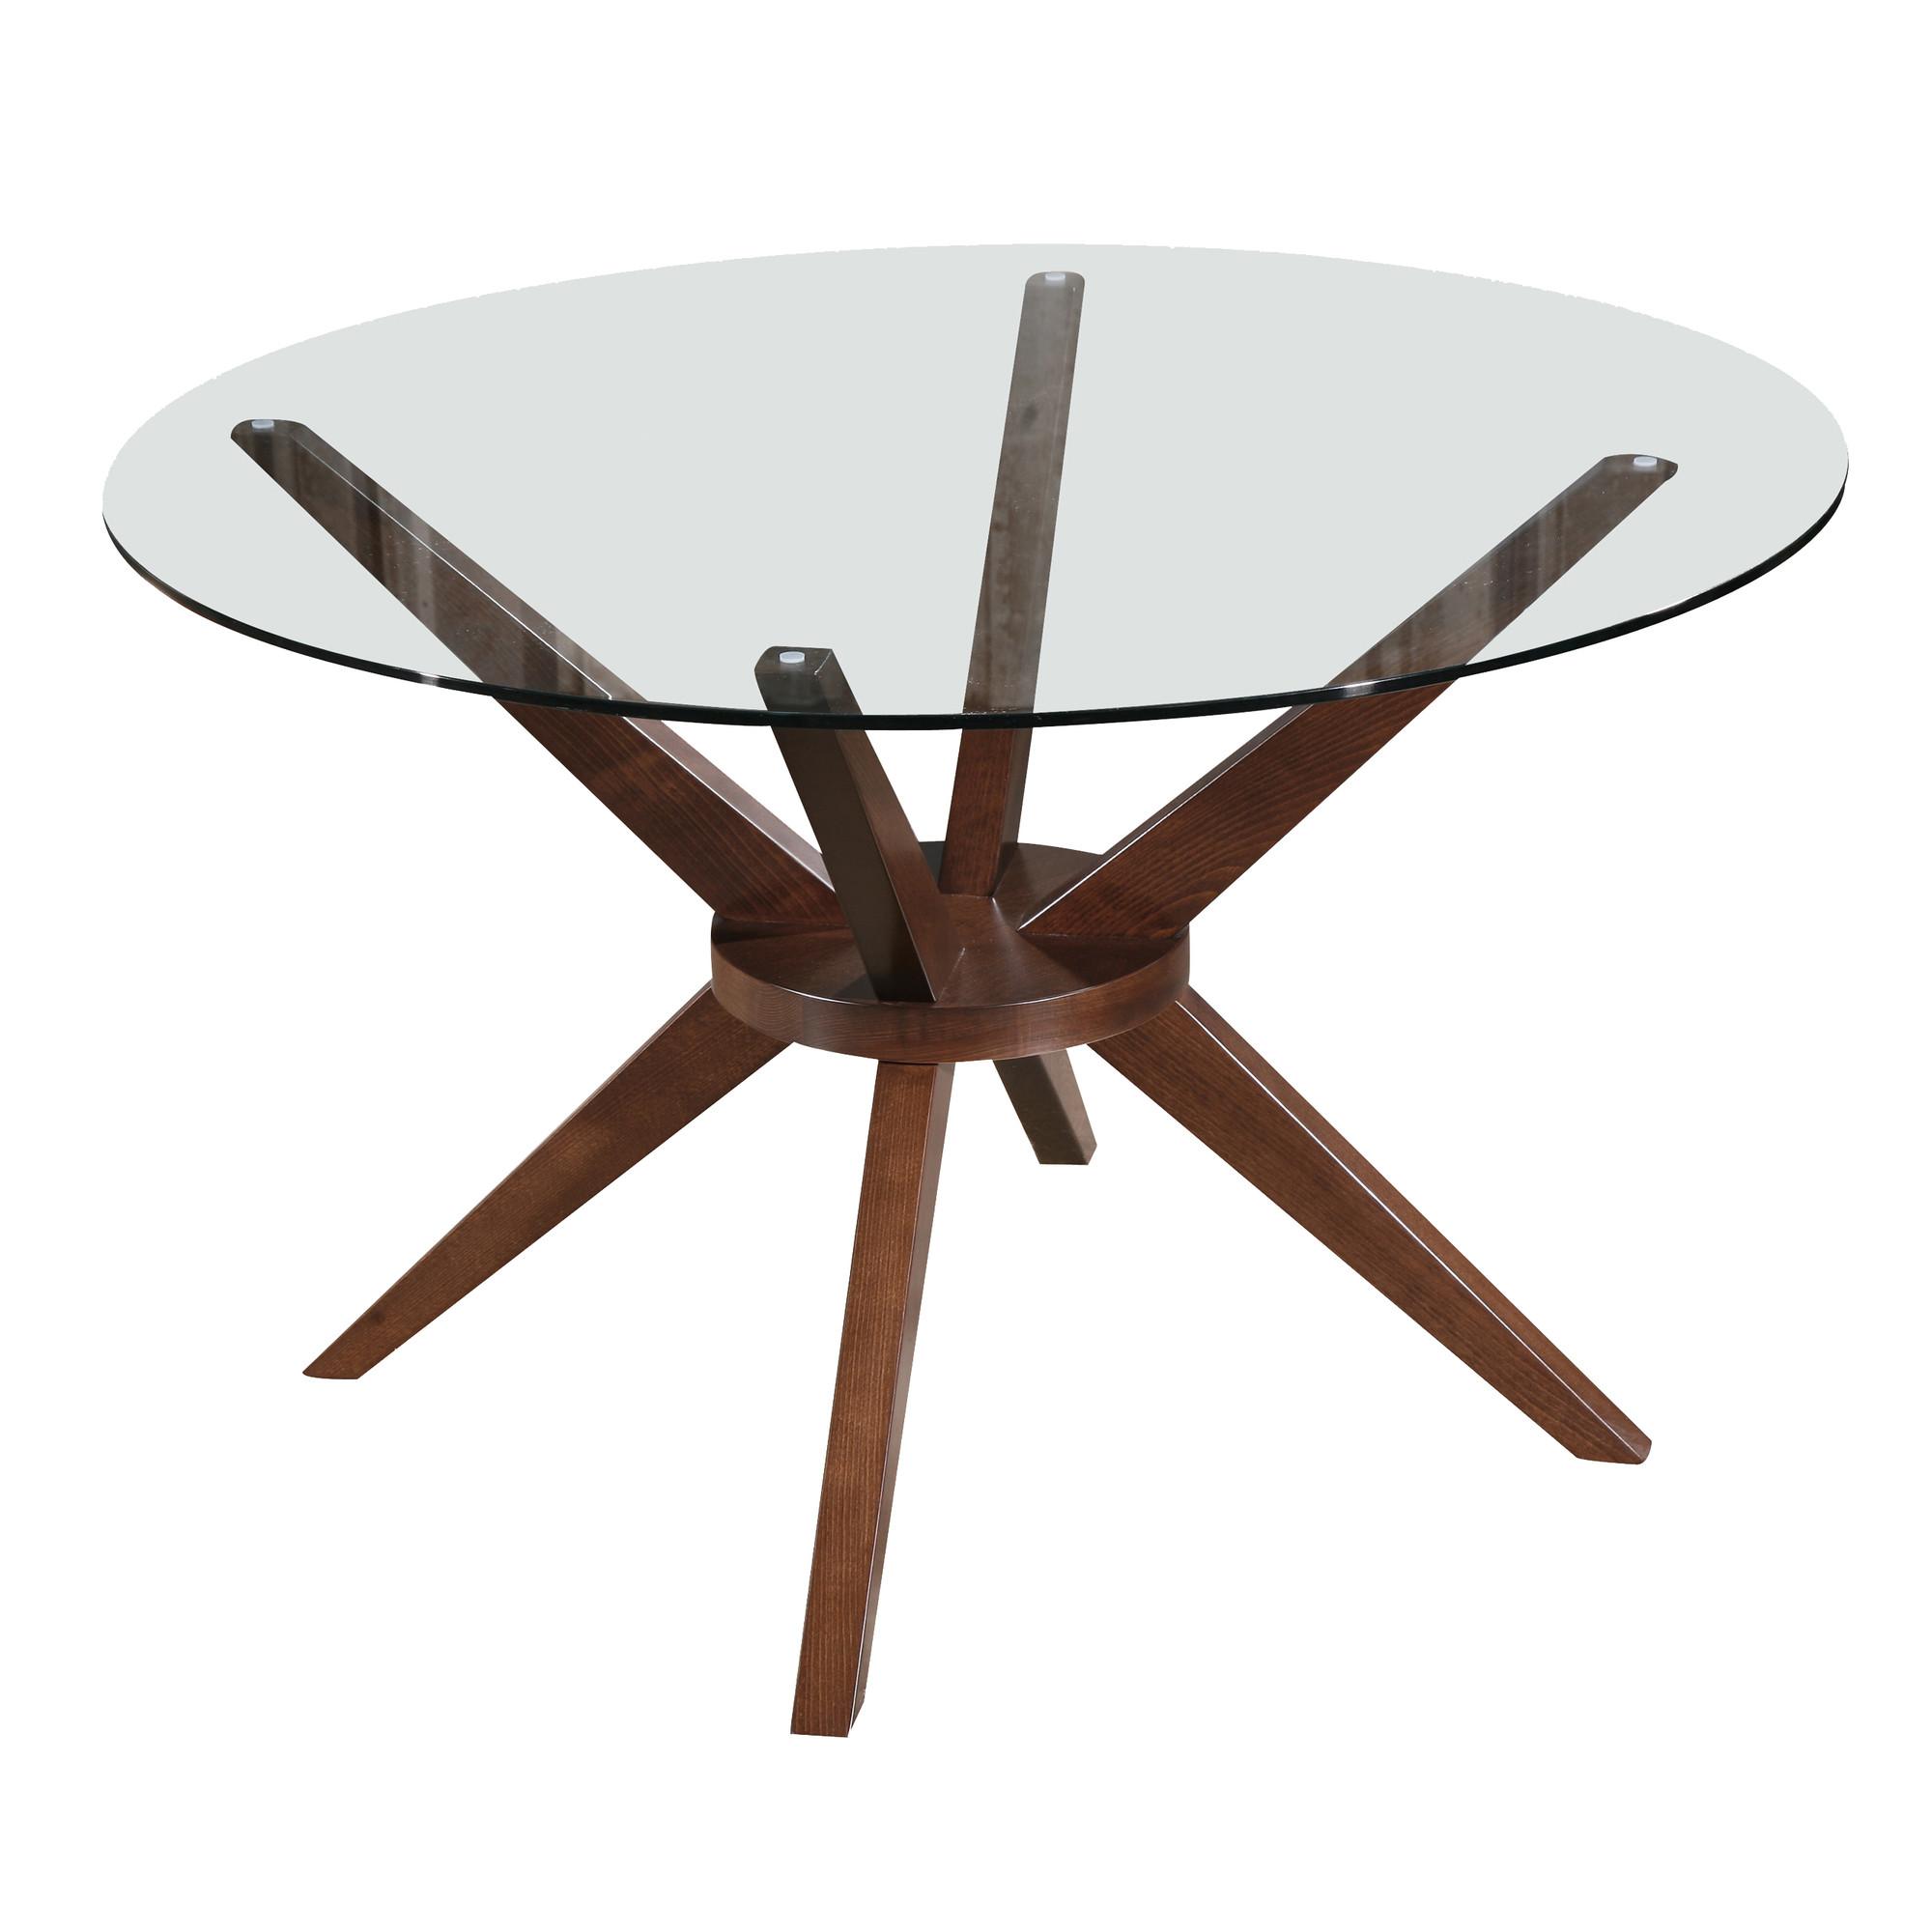 120cm Walnut Banza Round Dining Table